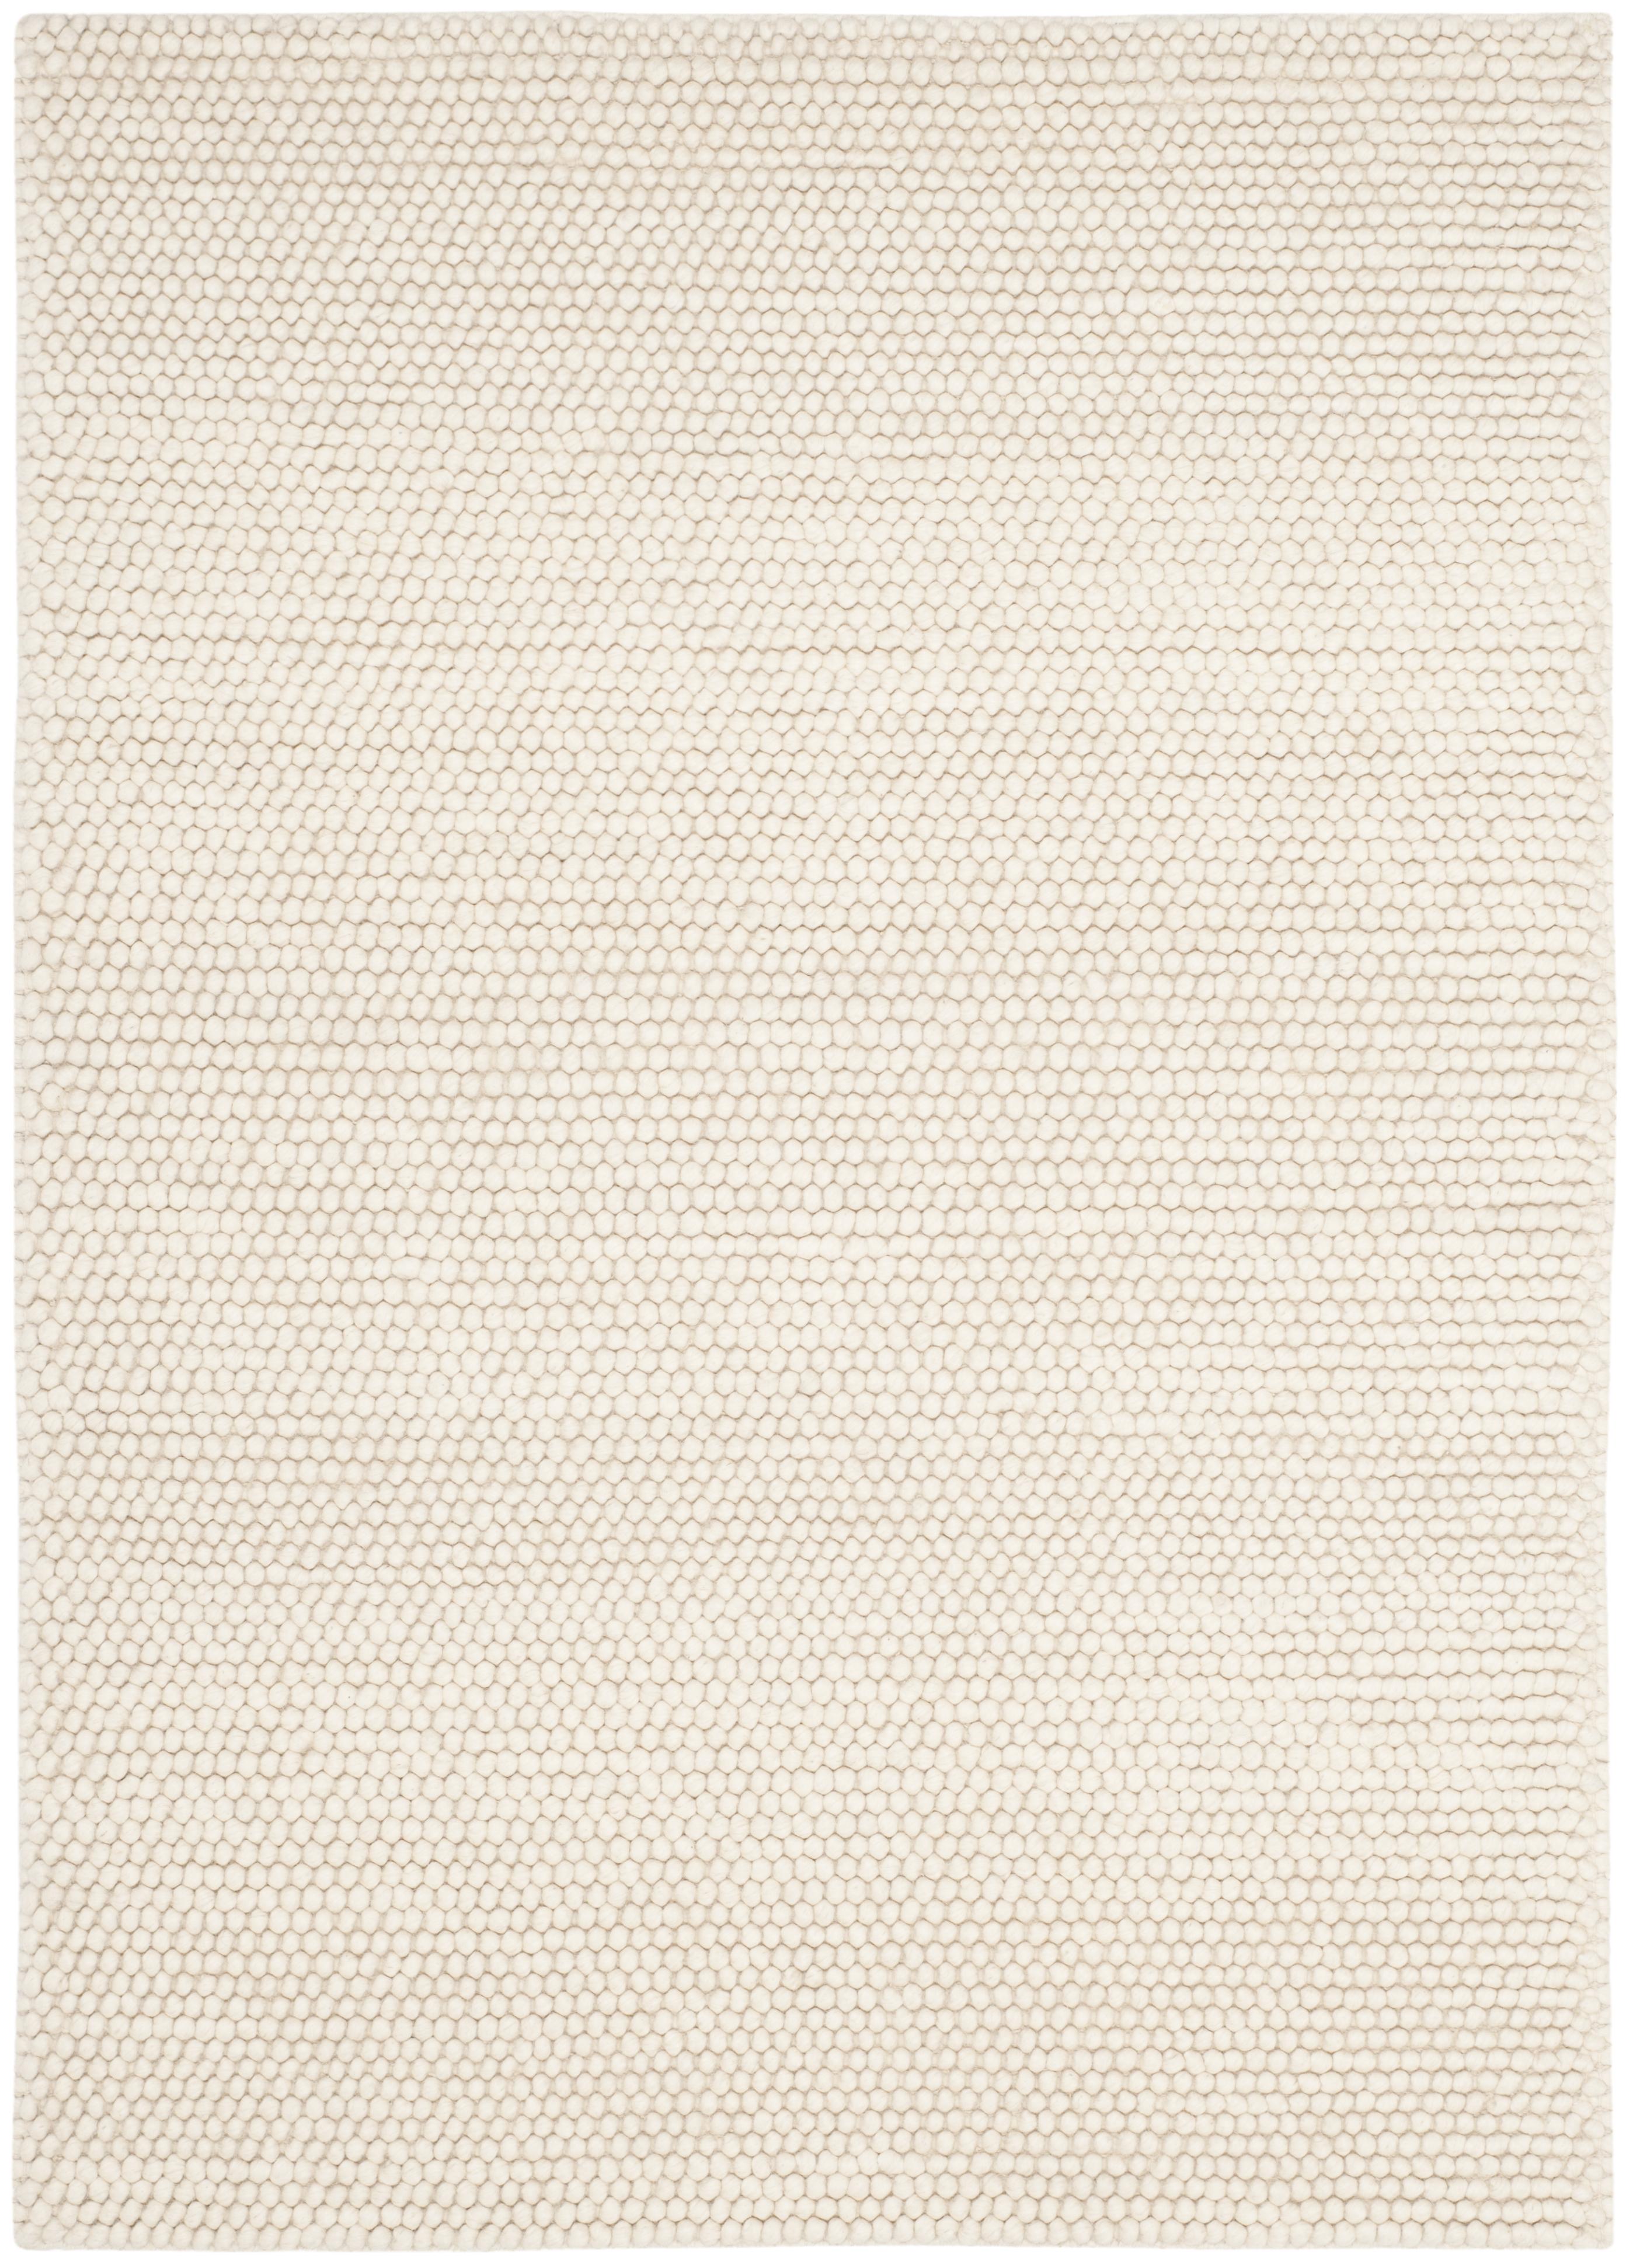 Chipley 620 3' X 5' Ivory Wool Rug